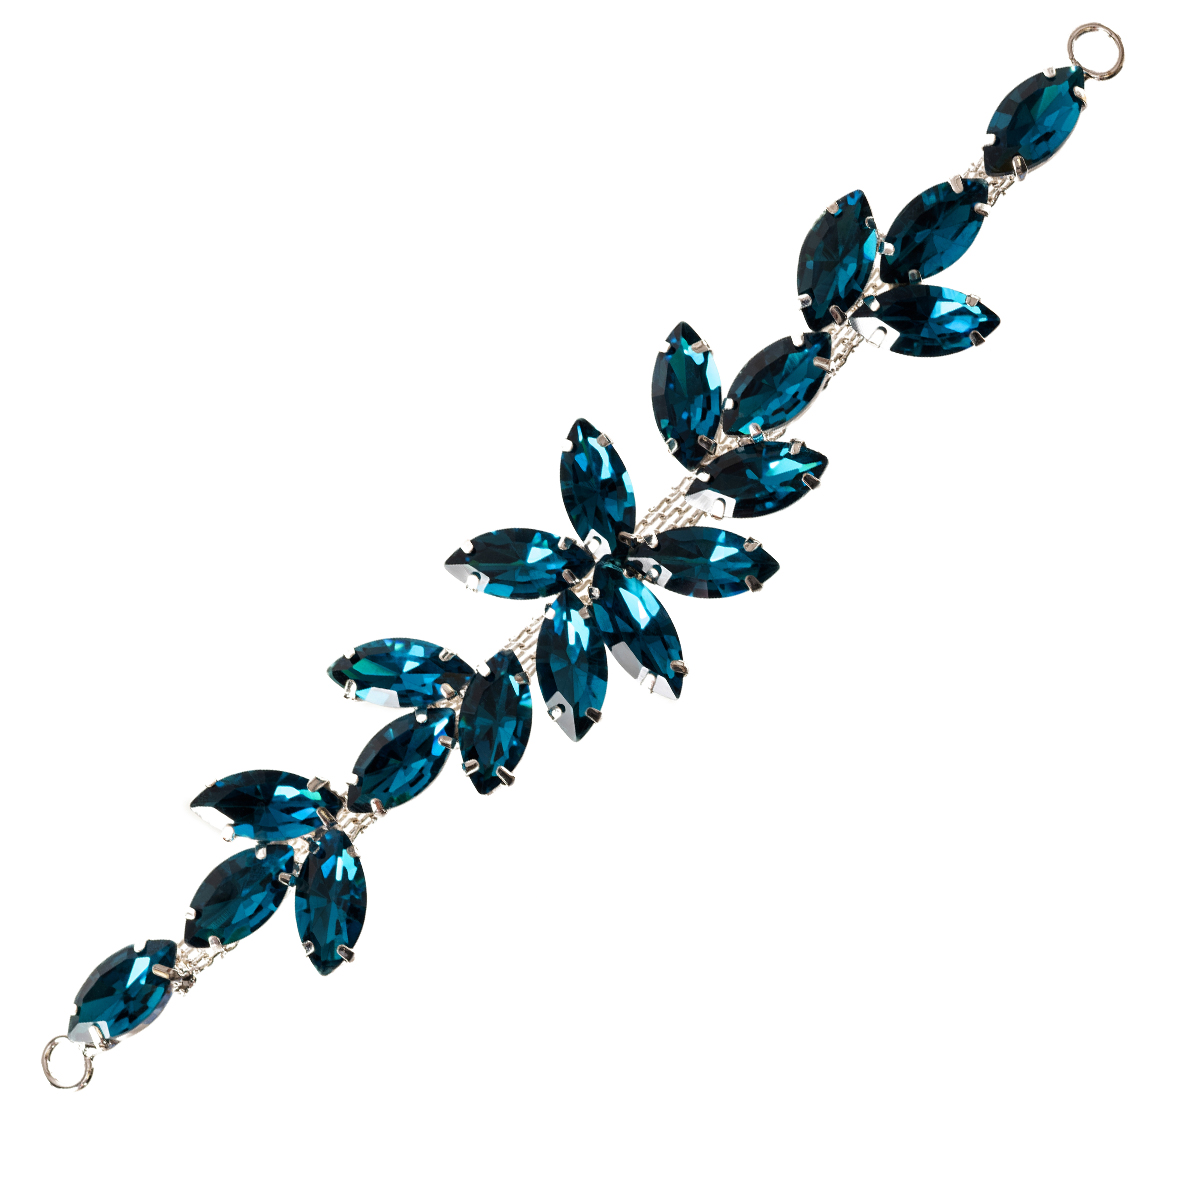 Rhinestone-Diamante-Motif-Applique-Sew-on-Crystal-Patch-for-Wedding-Bridal-Dress thumbnail 34